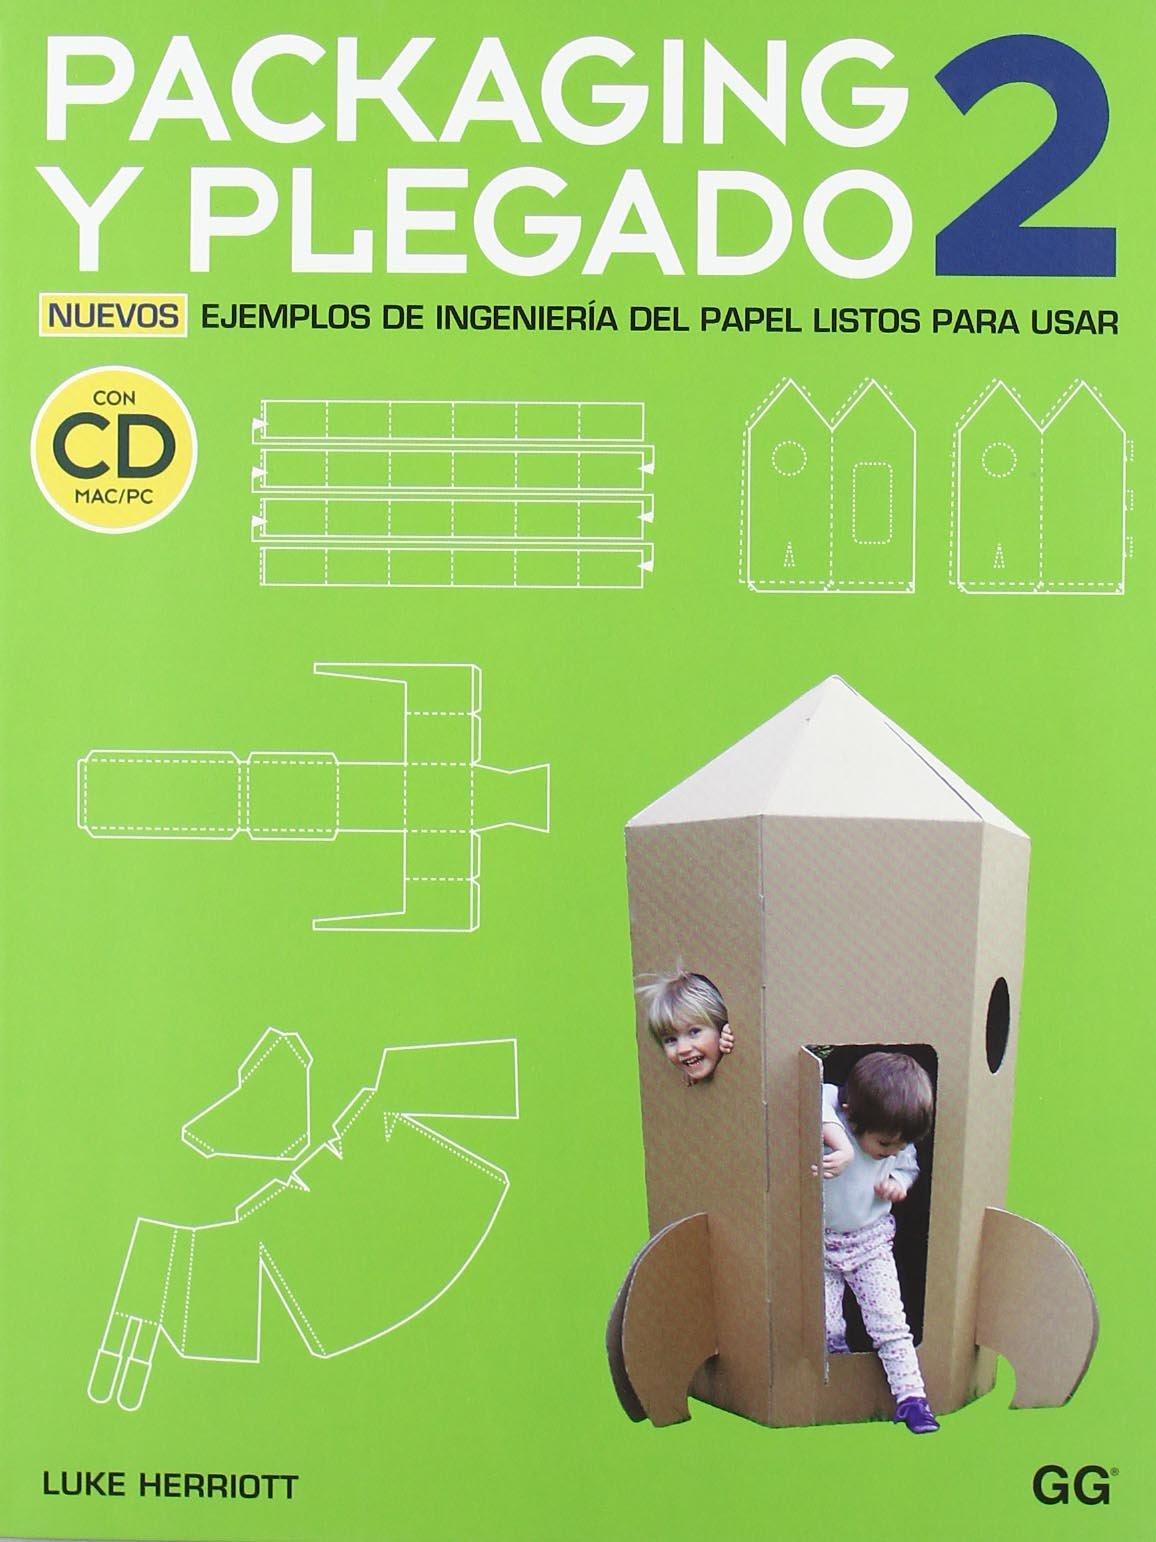 PACKAGING Y PLEGADO 2 - CON CD (Spanish Edition): HERRIOTT LUKE: 9788425223969: Amazon.com: Books